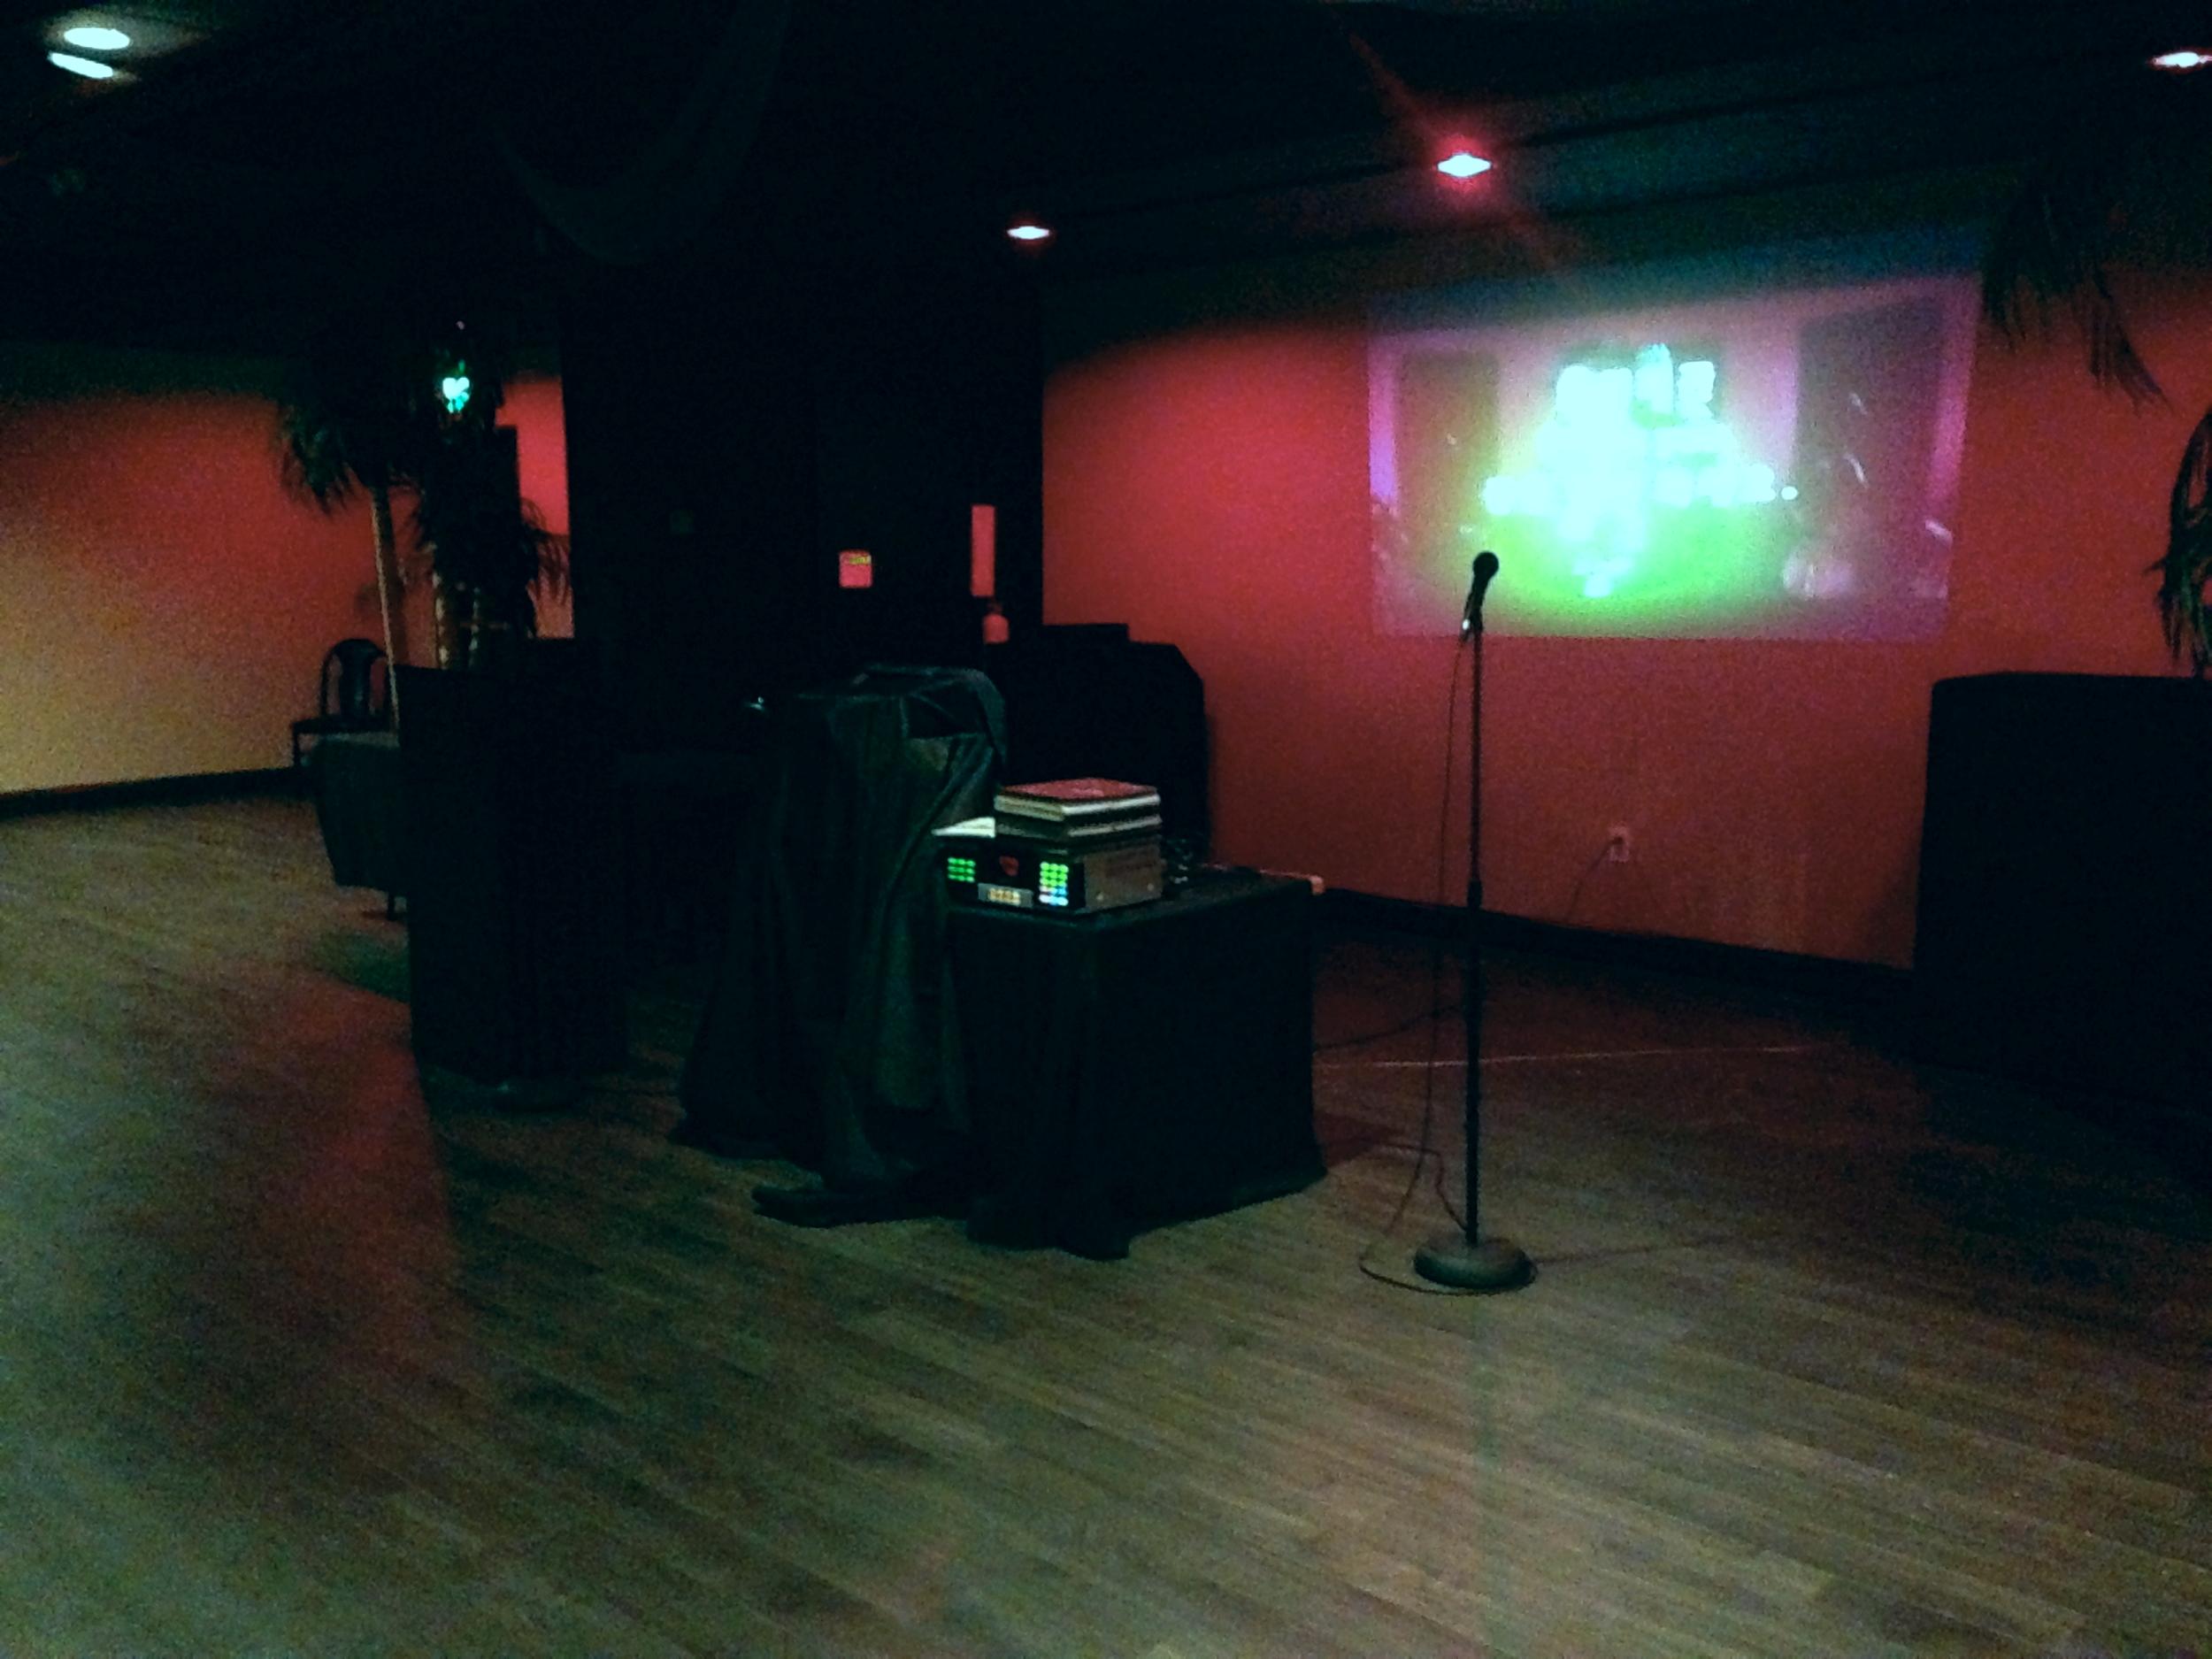 Karaoke + A/V setup